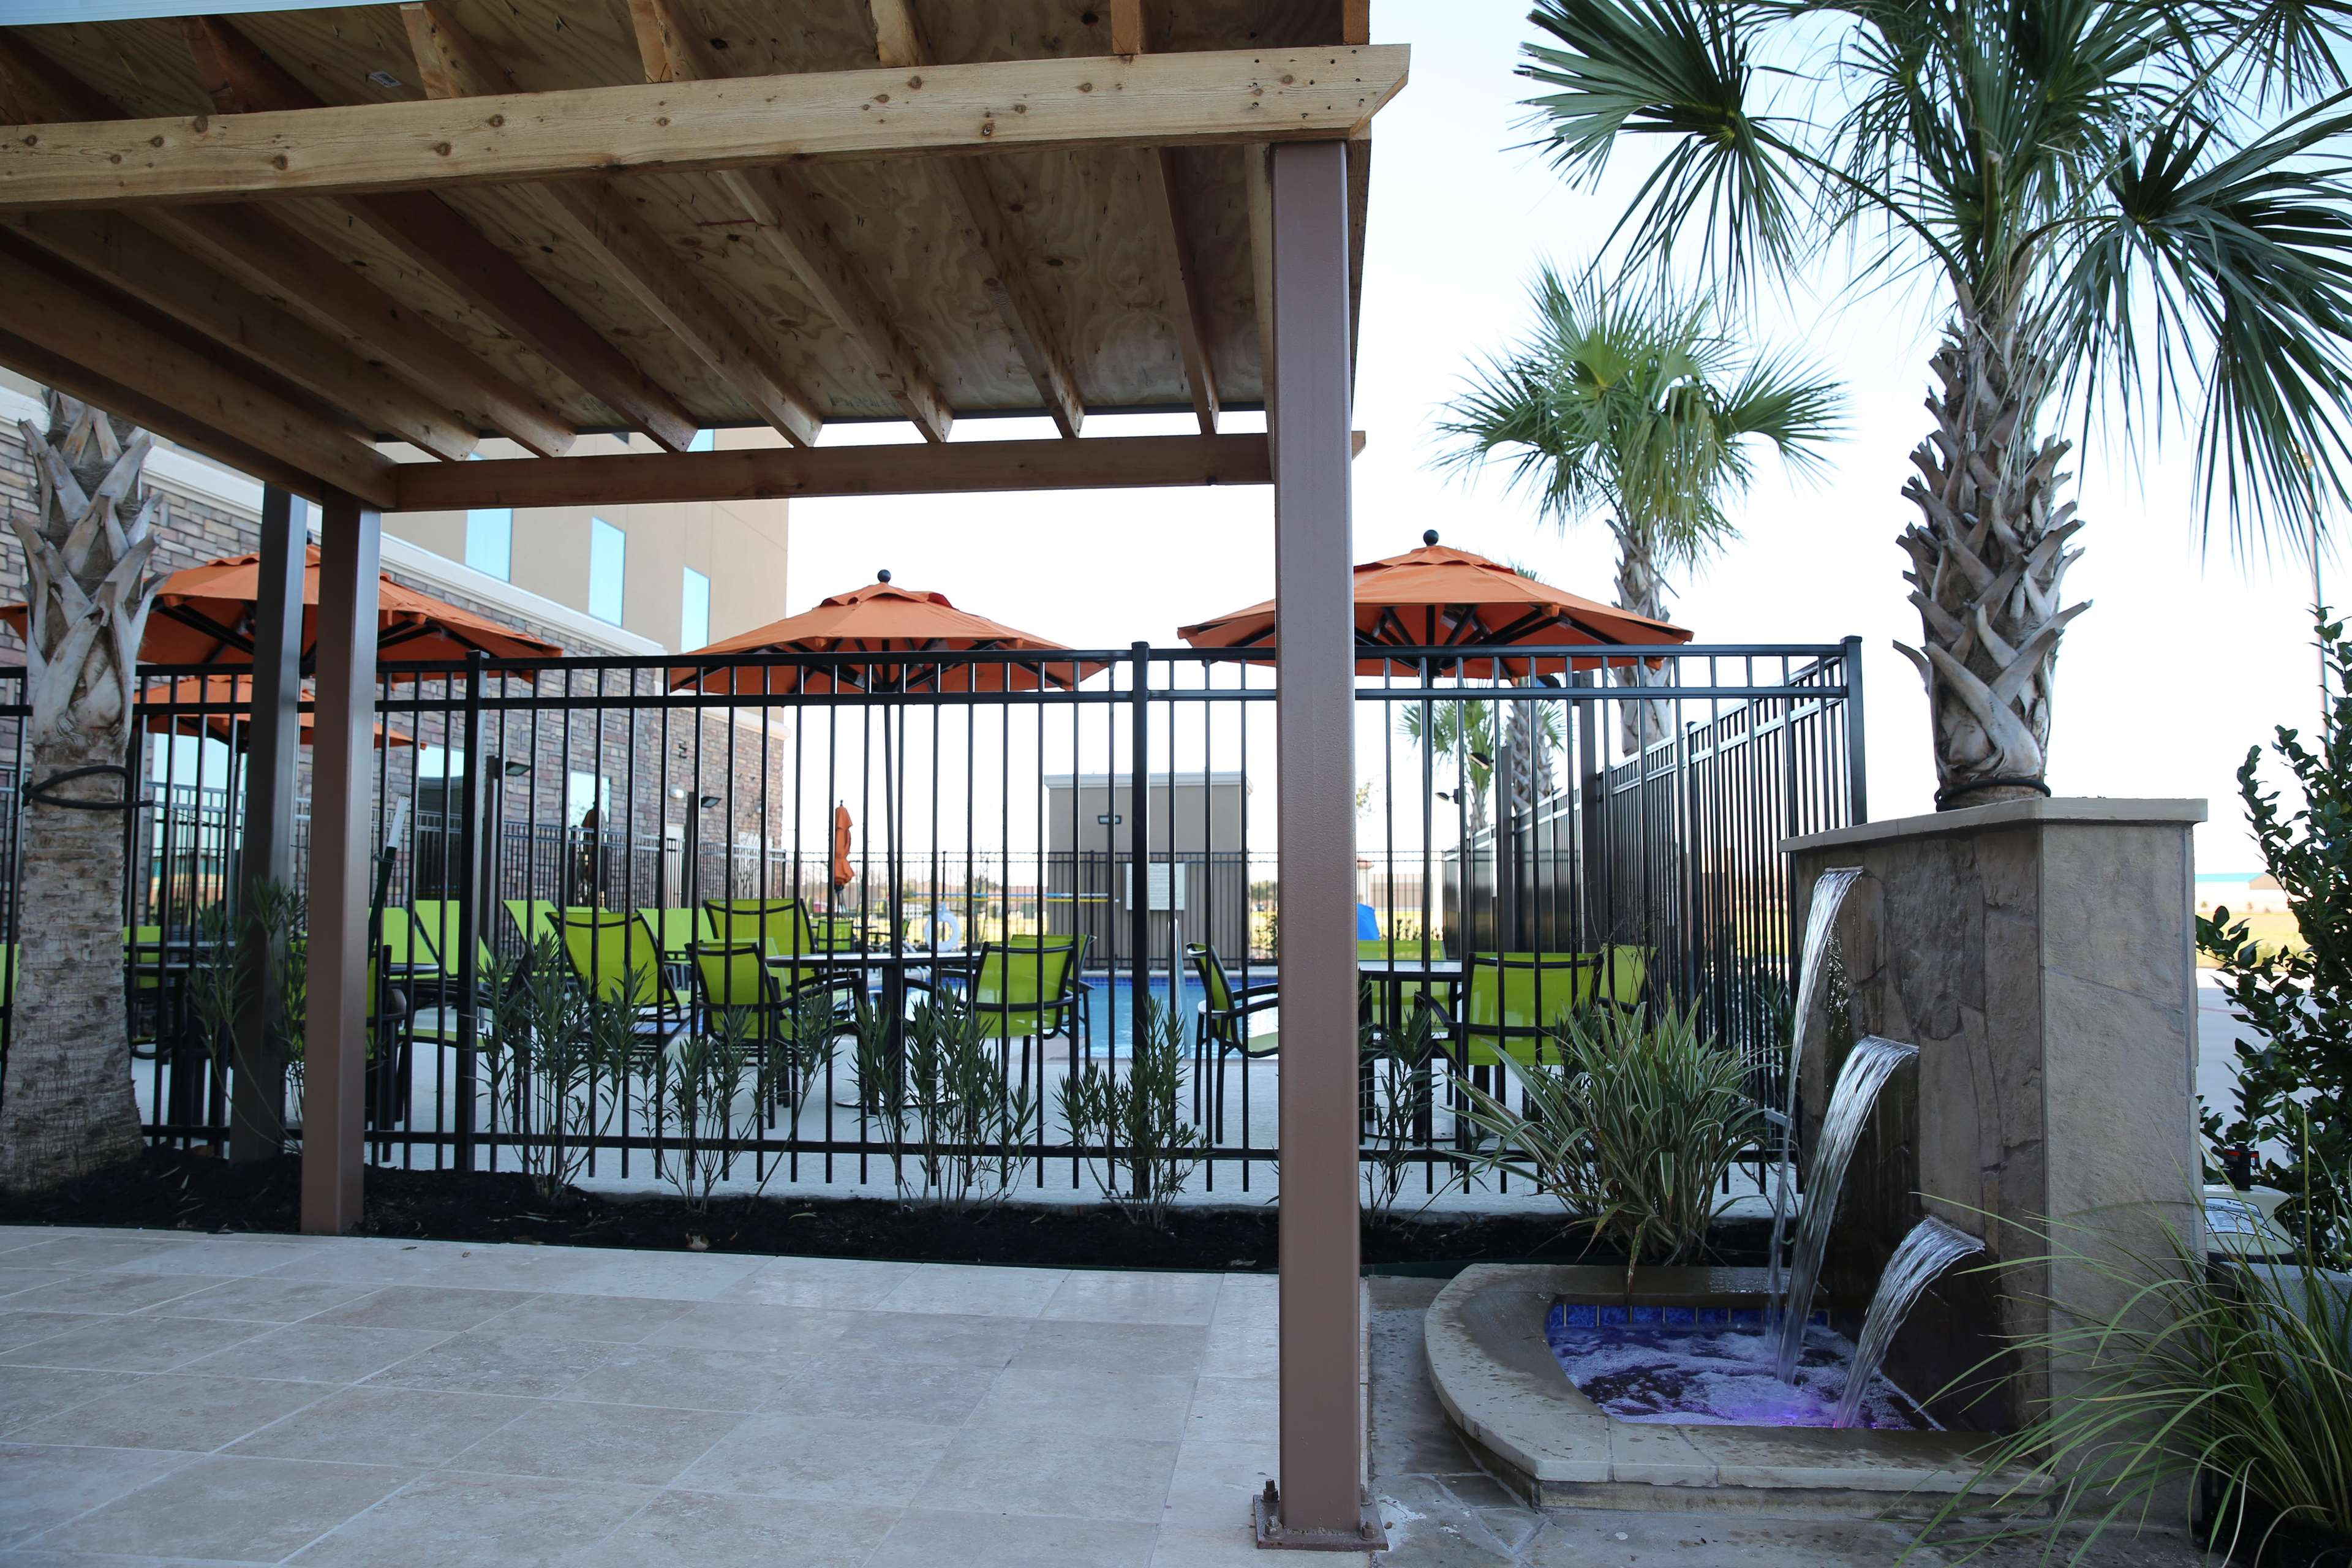 Hampton Inn & Suites Missouri City, TX image 2